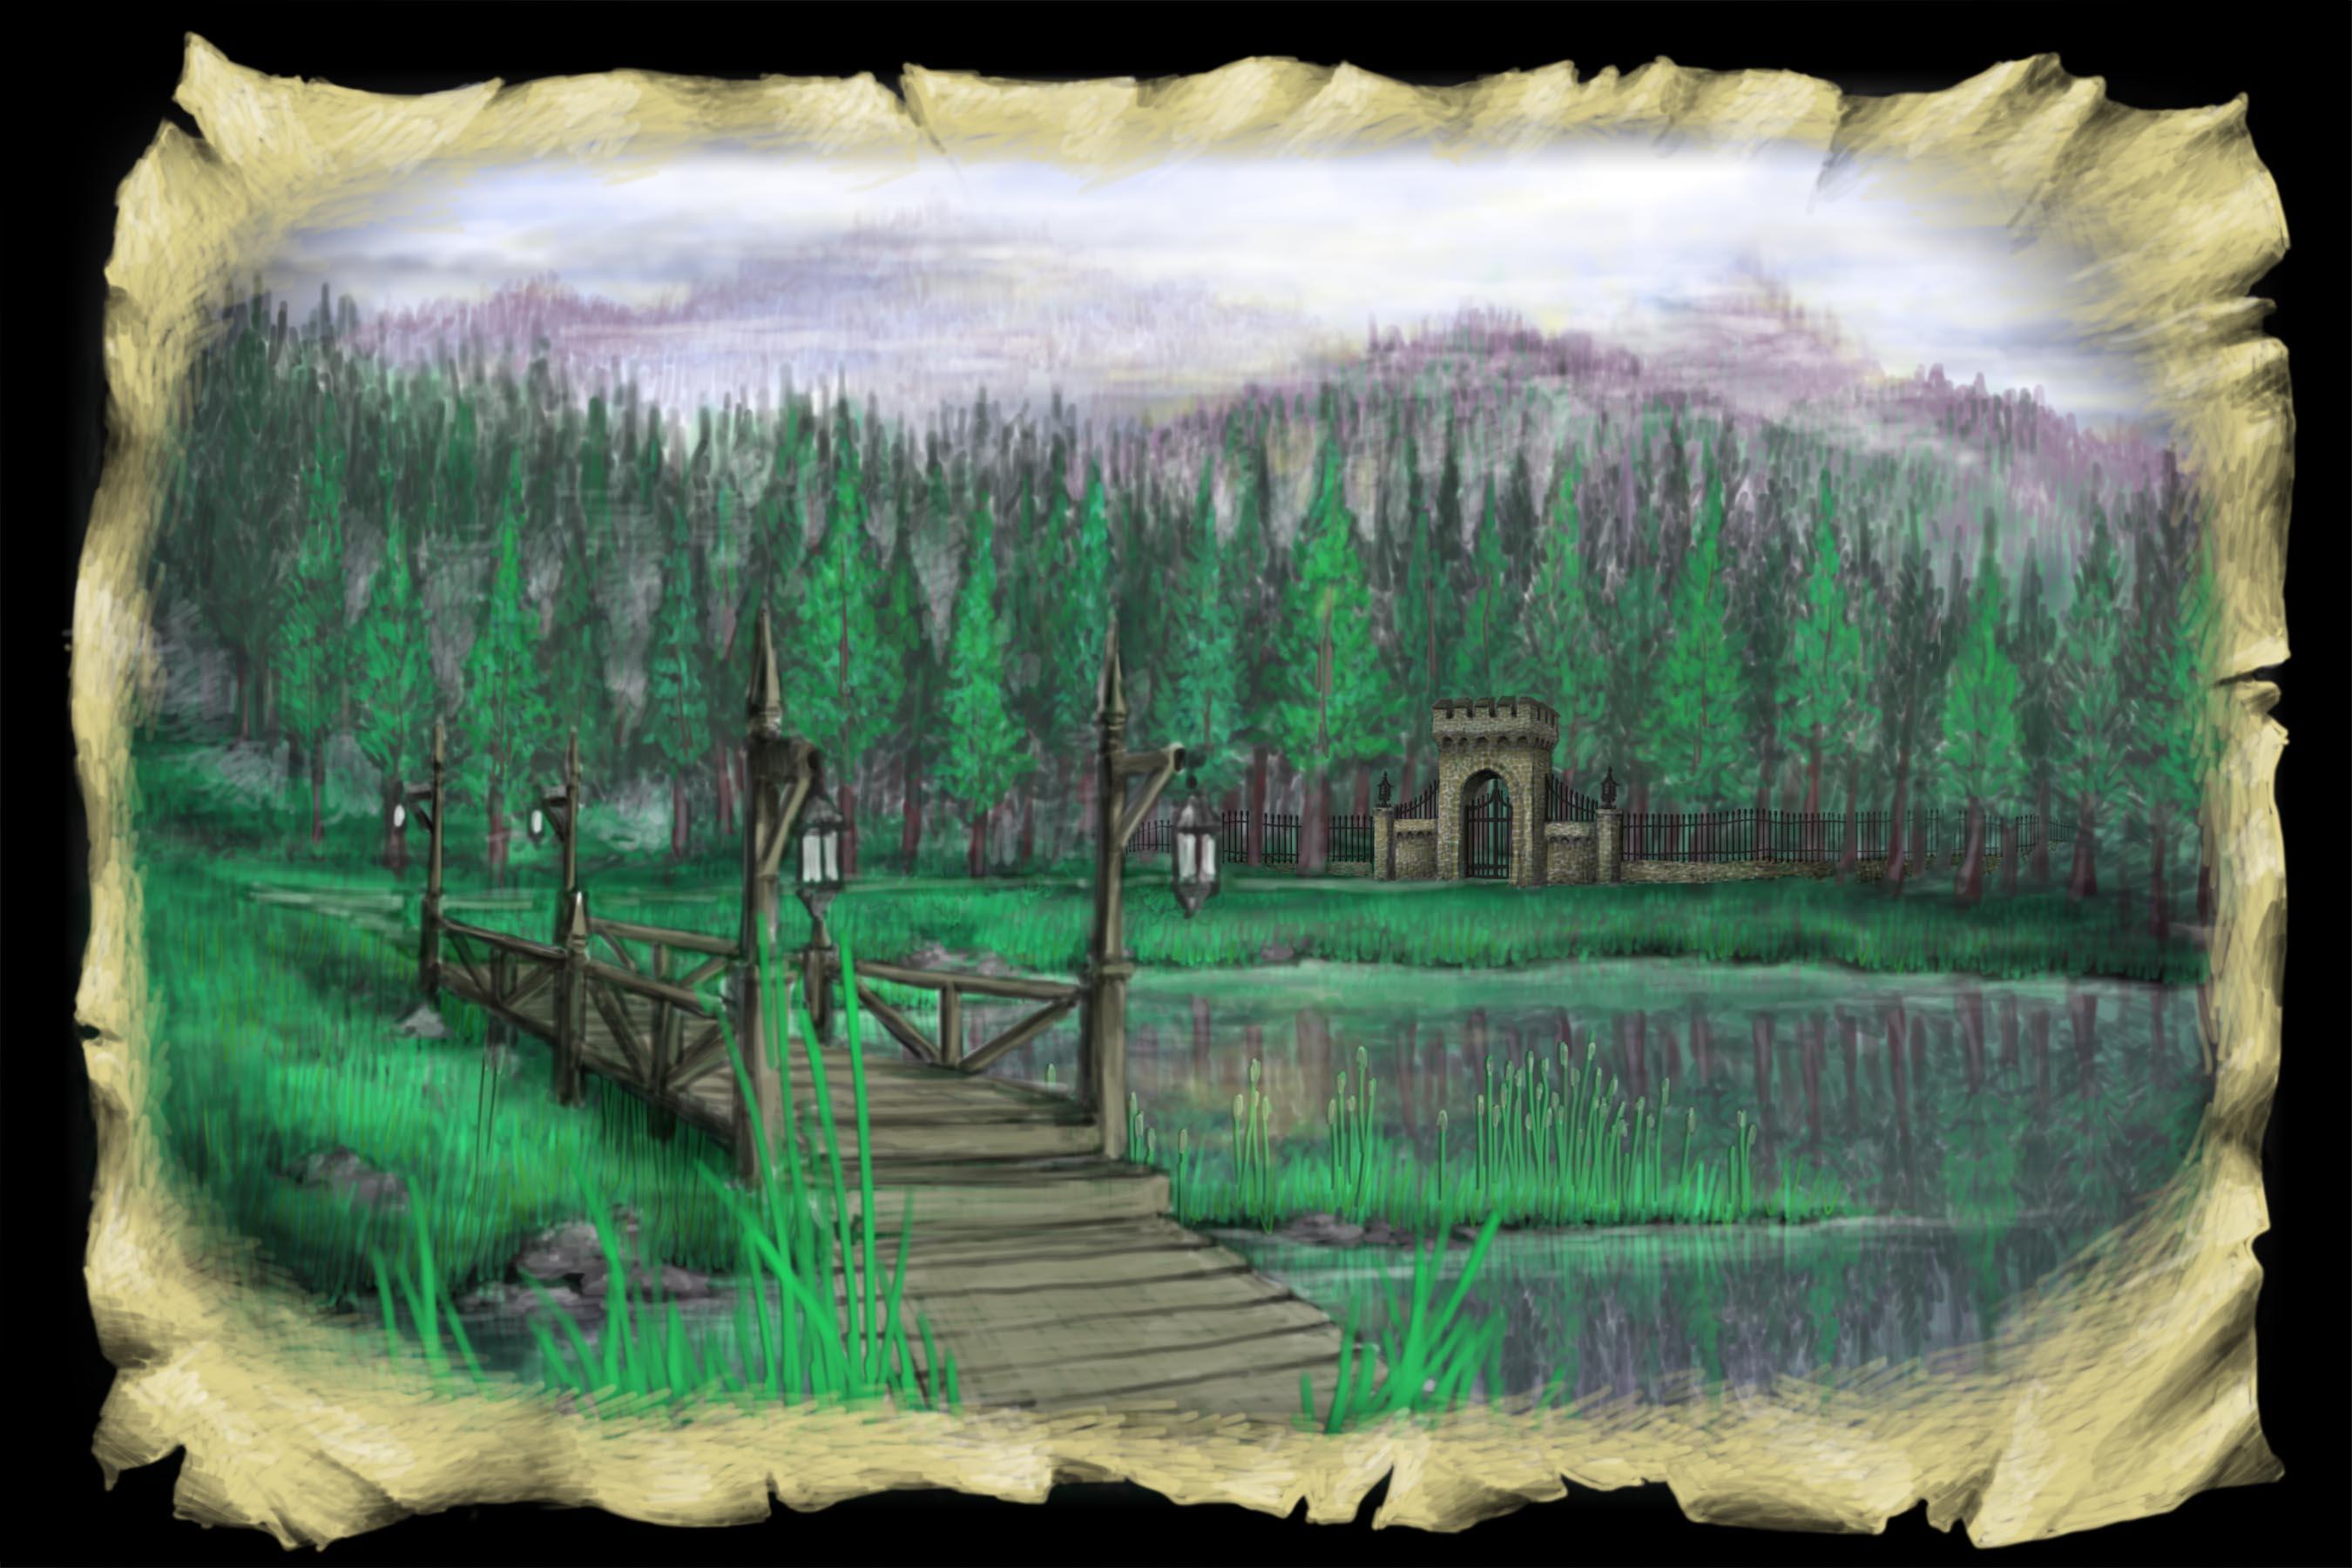 Scene 2b. Lake and Bridge, Daytime